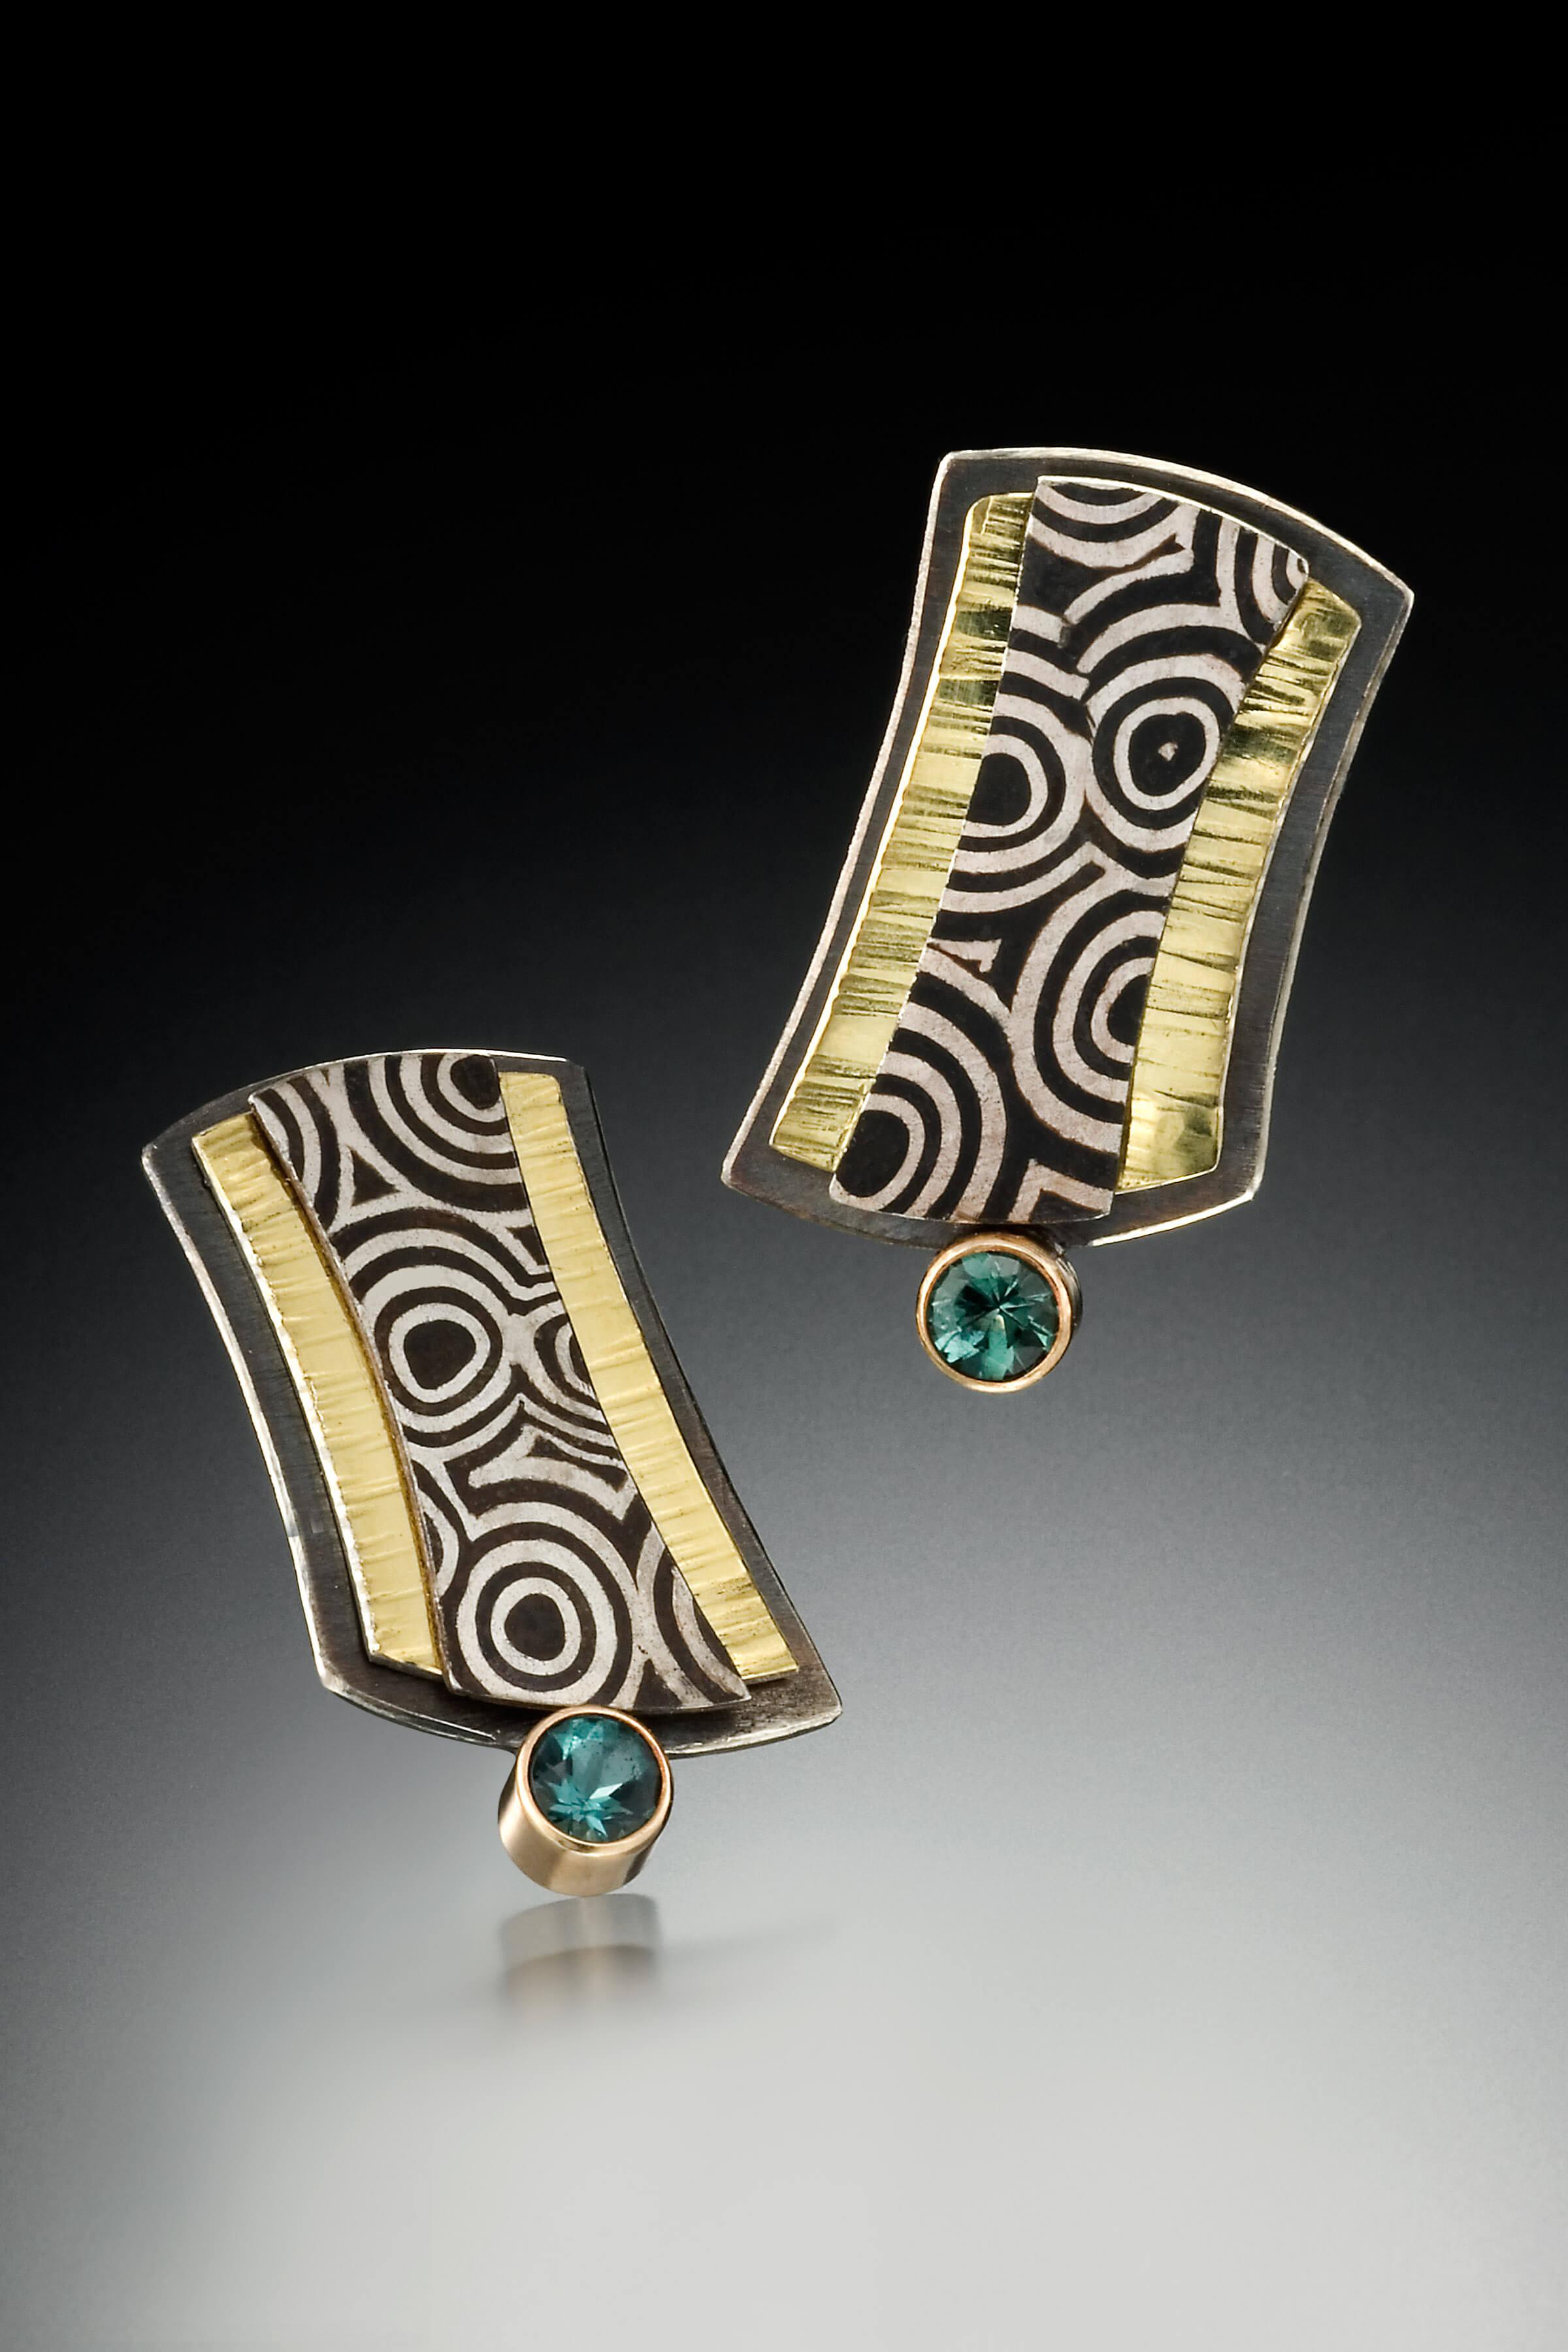 Kara Raymond Studio, Kimonos, Handmade Jewelry Woodstock-New Paltz Art & Crafts Fair